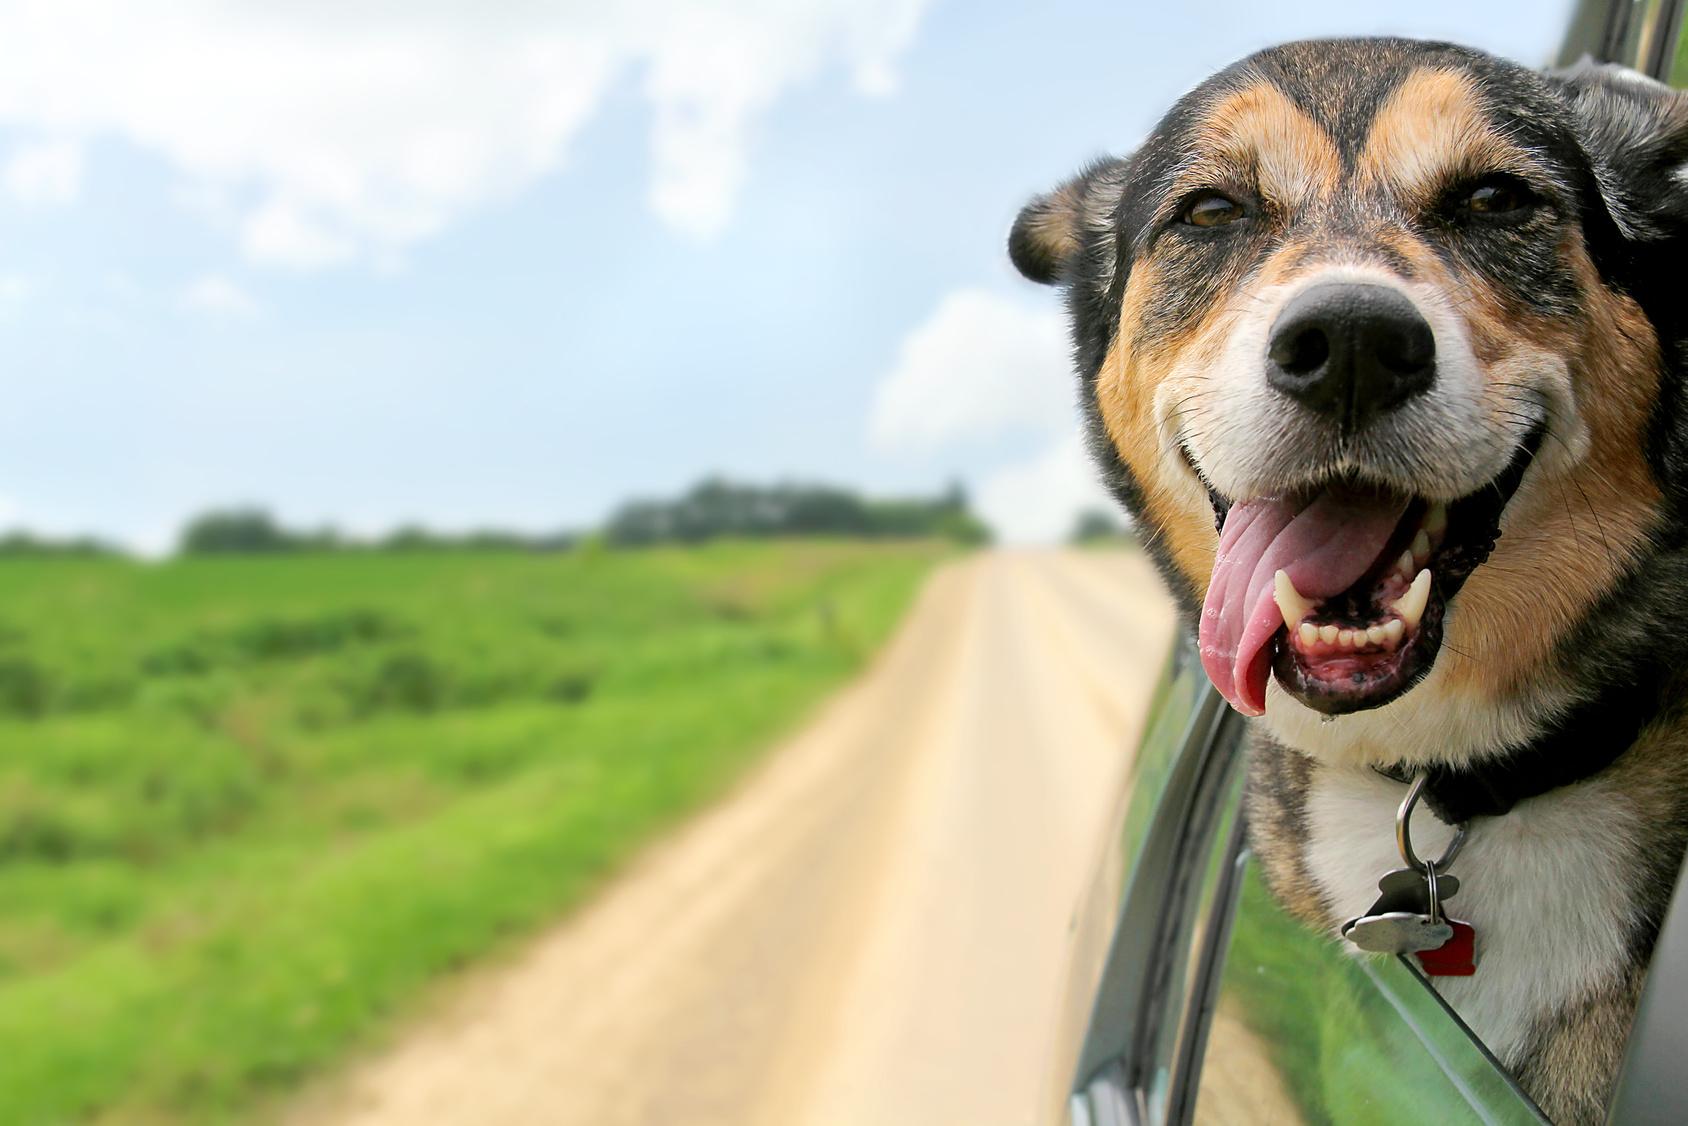 ВСША собаки угнали машину ухозяйки иврезались встену